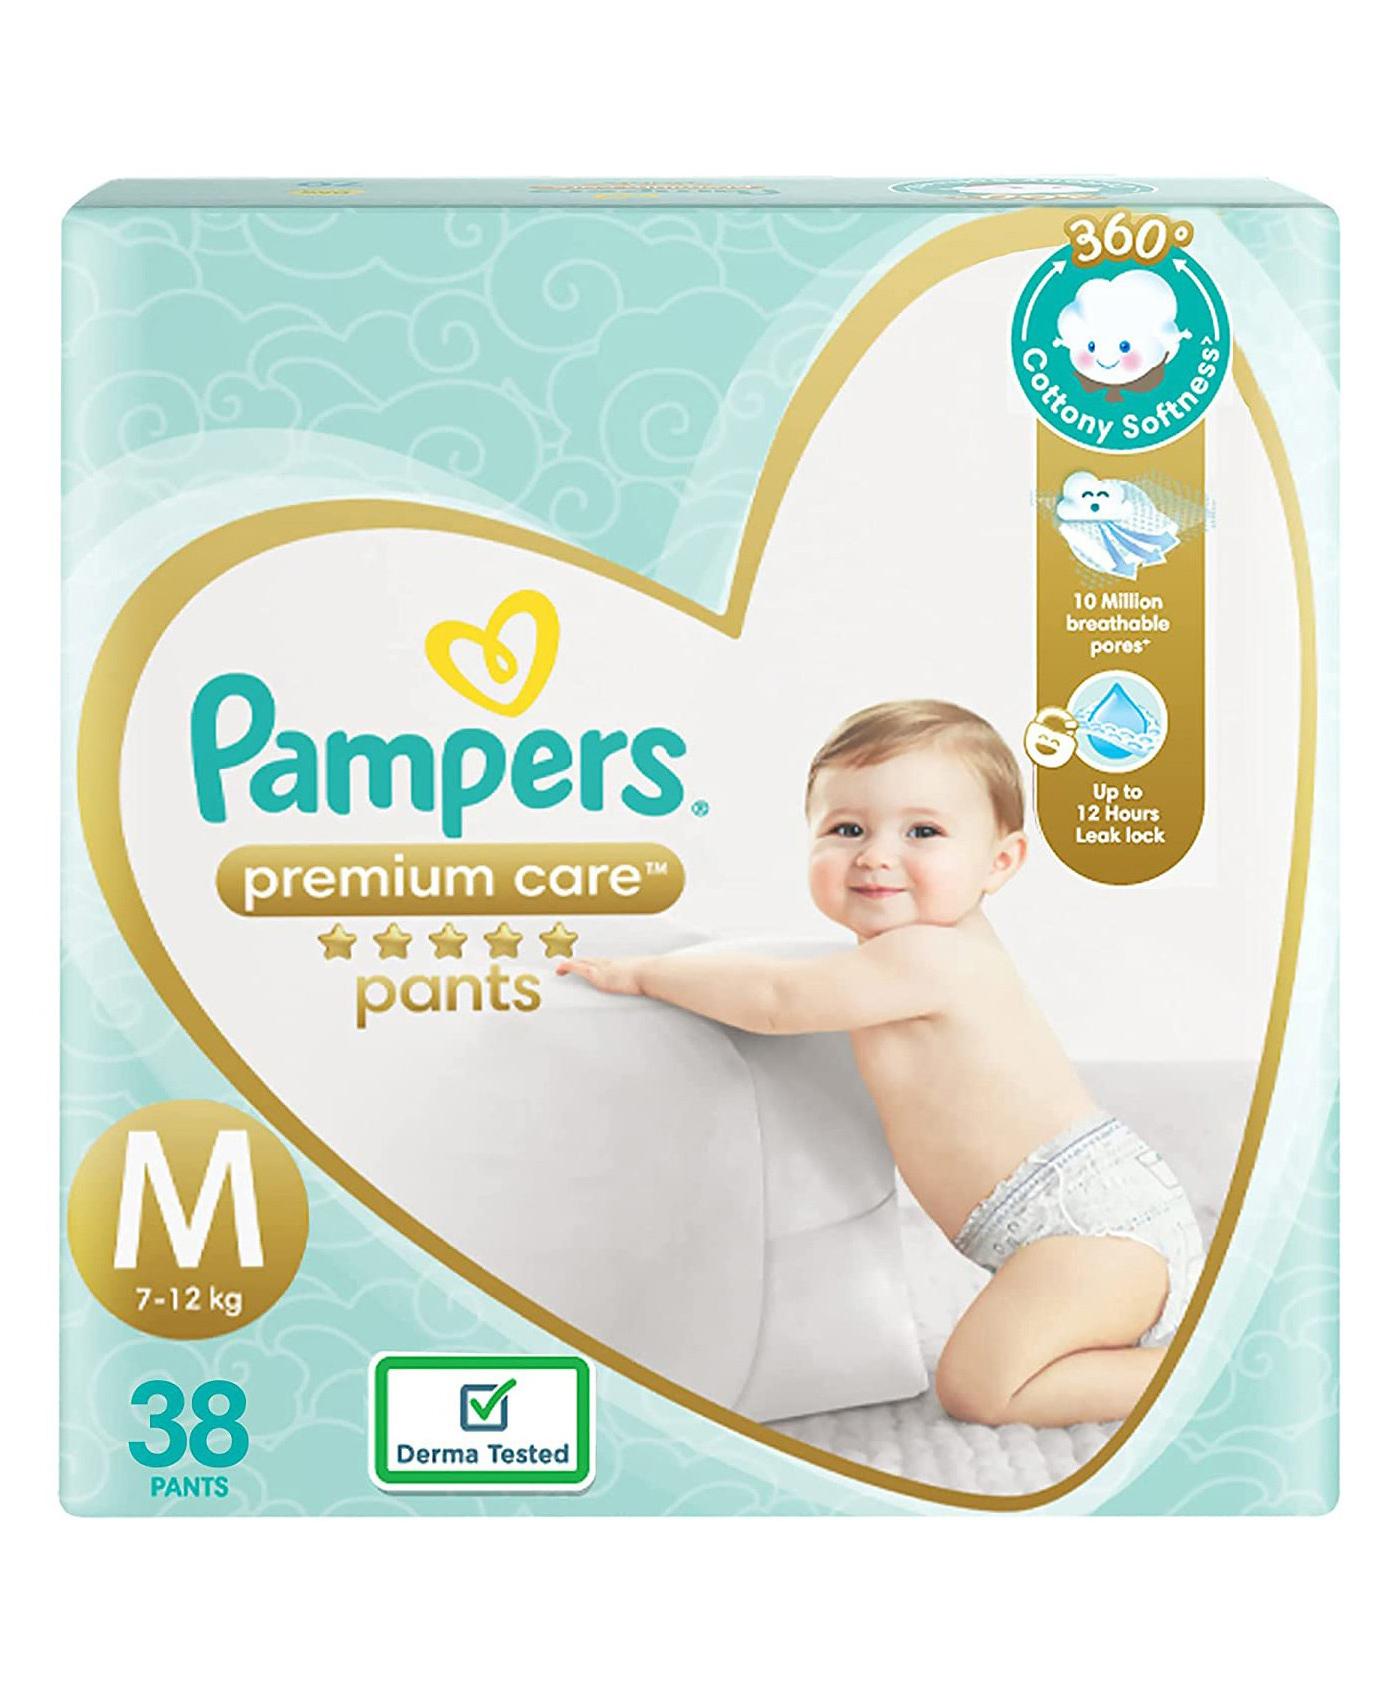 b90d37d42d Pampers Premium Care Pant Style Diapers Medium Size 38 Pieces ...